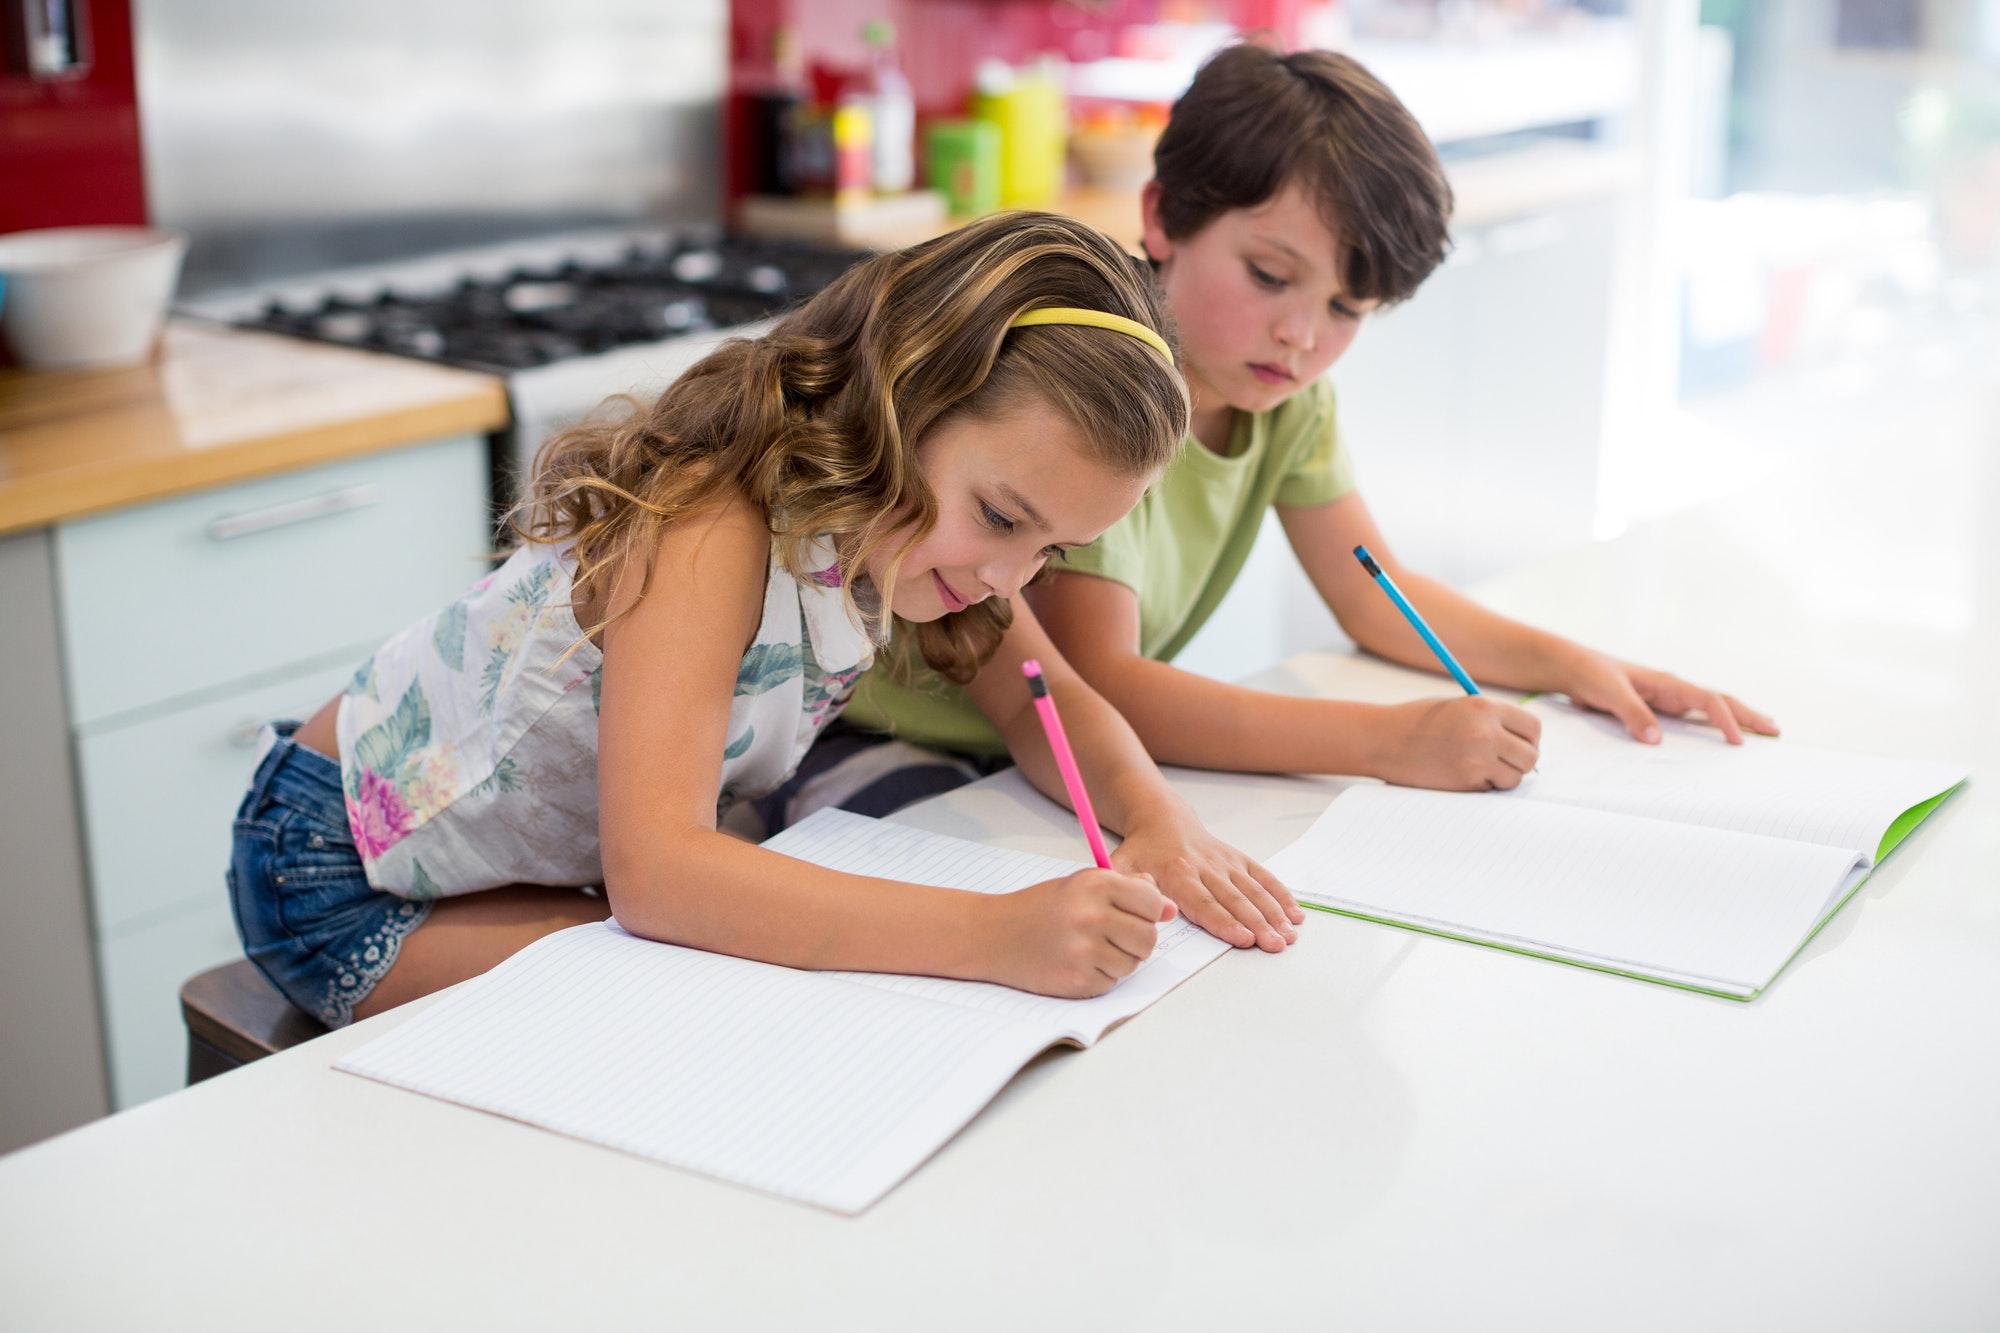 Siblings doing homework in kitchen